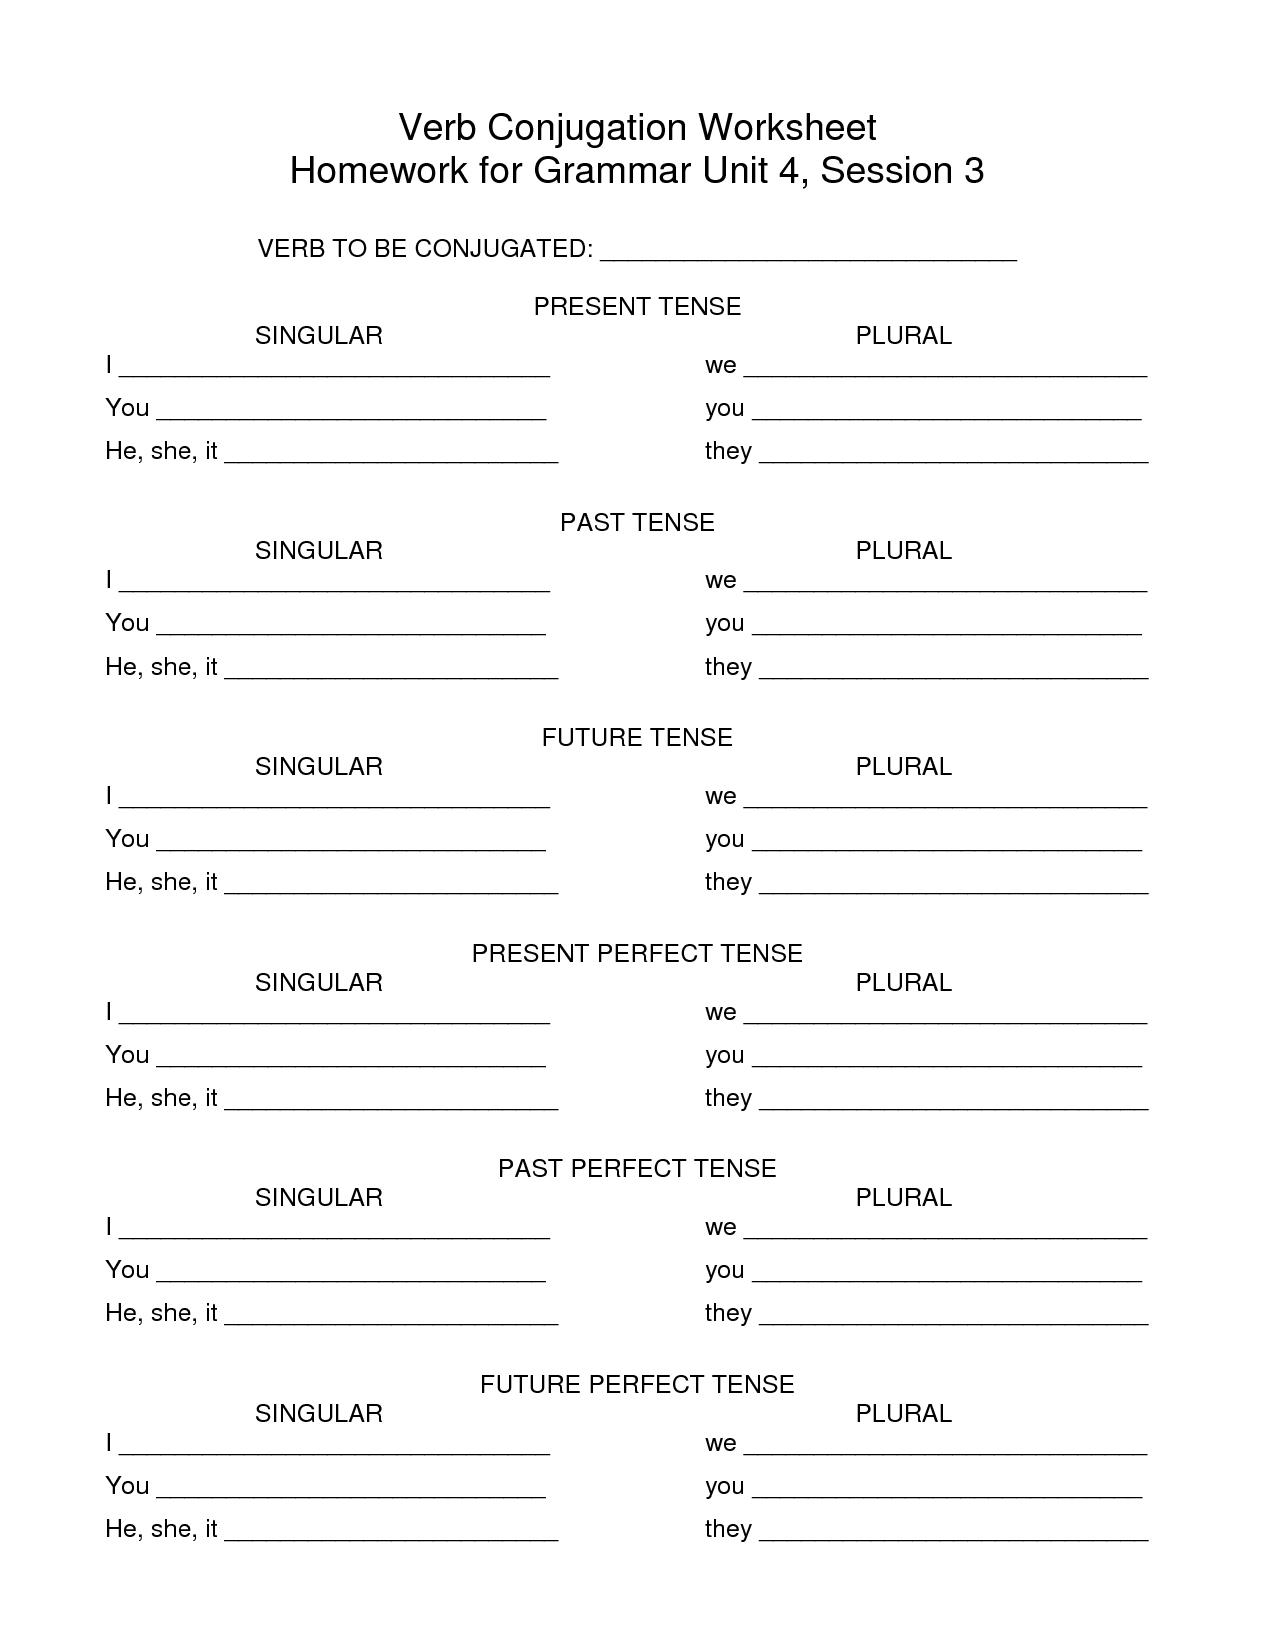 Spanish verb conjugation worksheets blank also editable chart template regular verbs rh pinterest